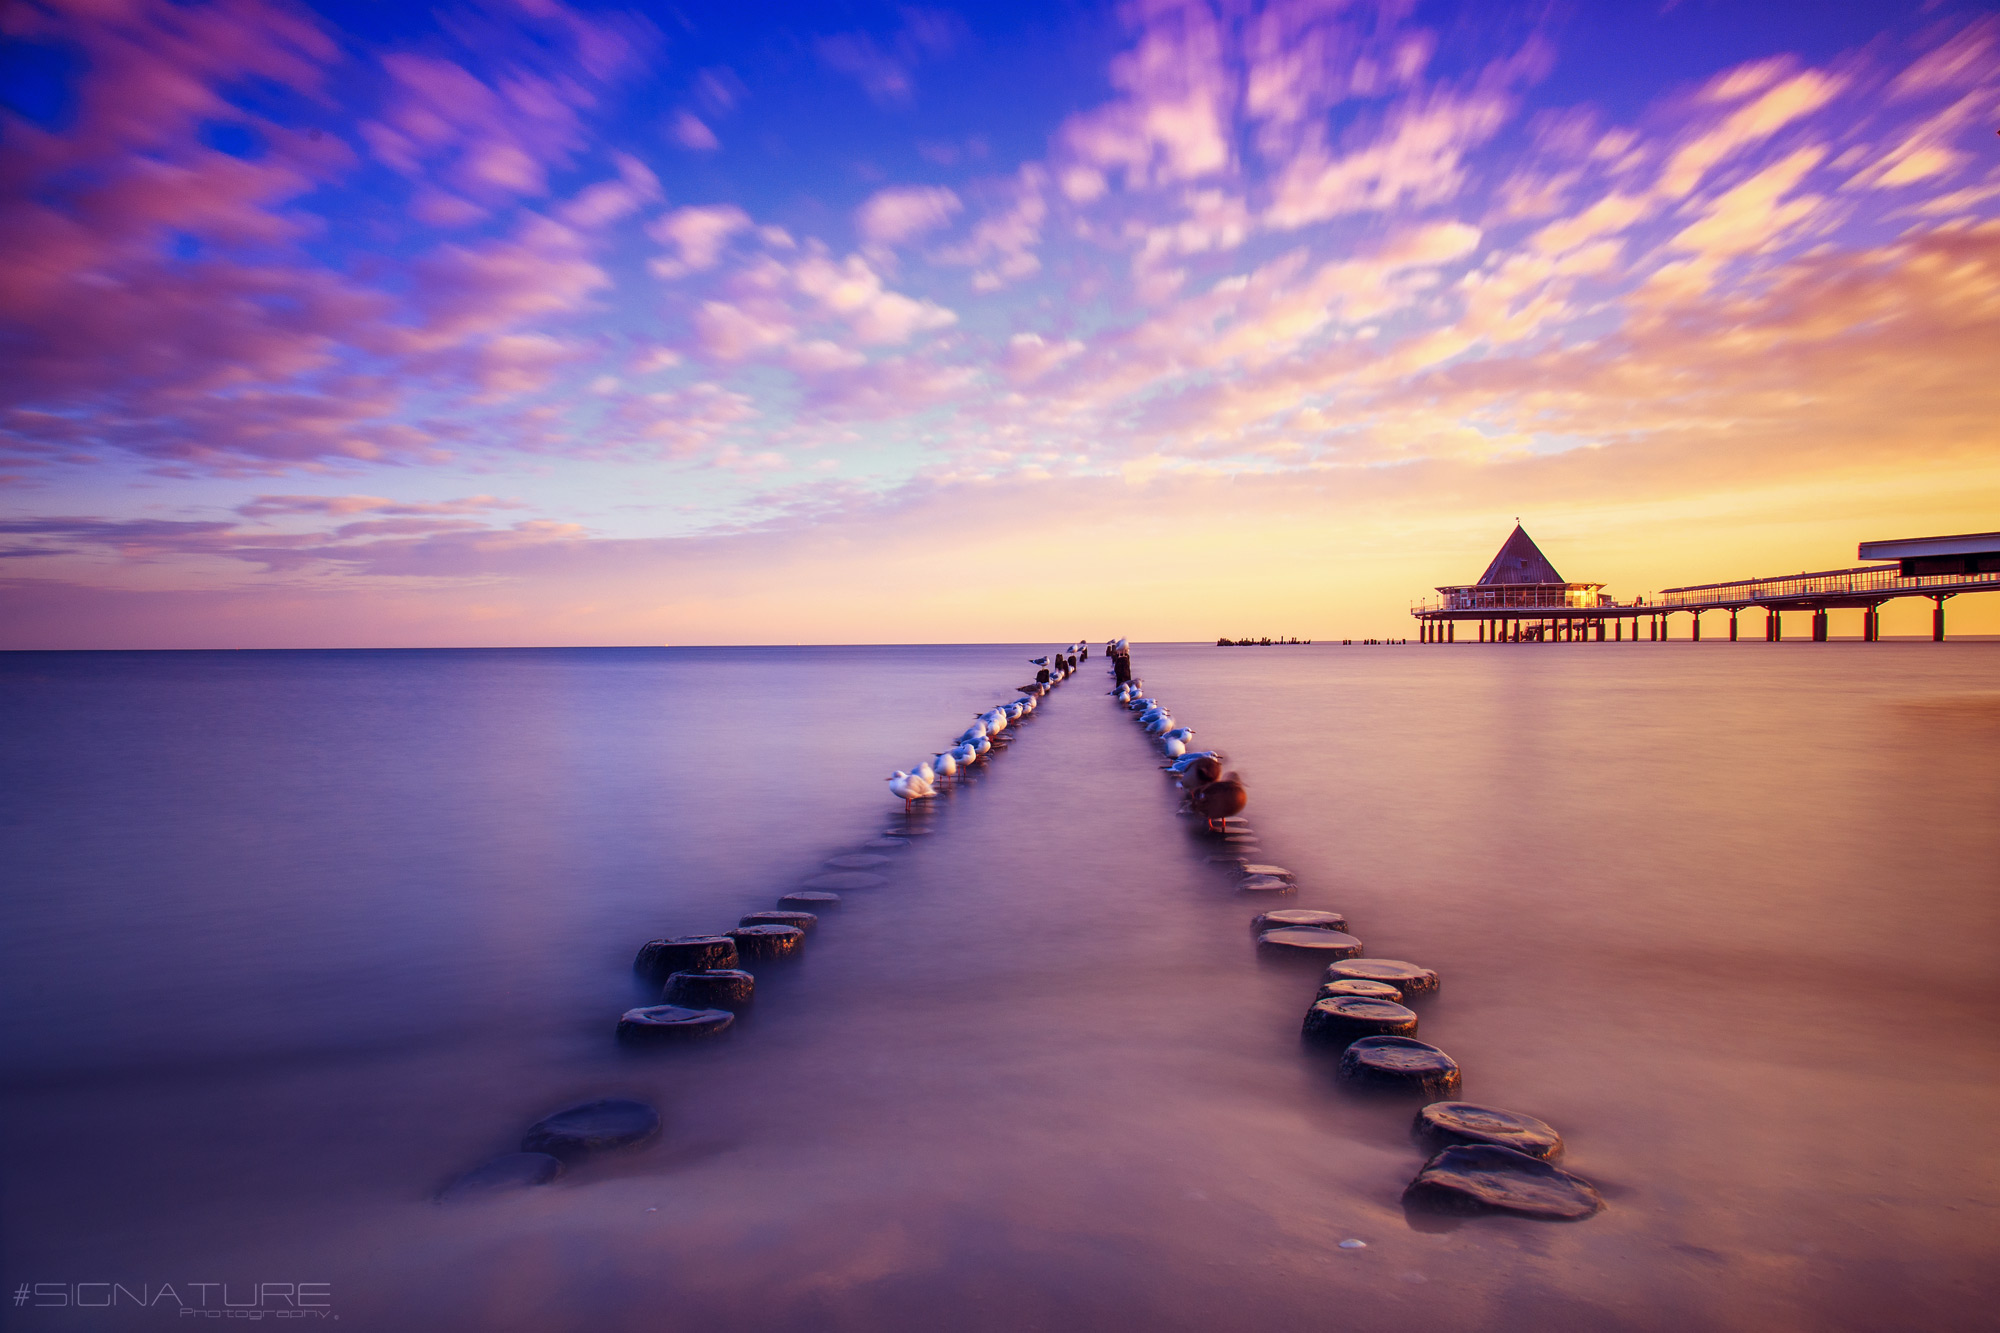 Sunset on Baltic Sea, Germany